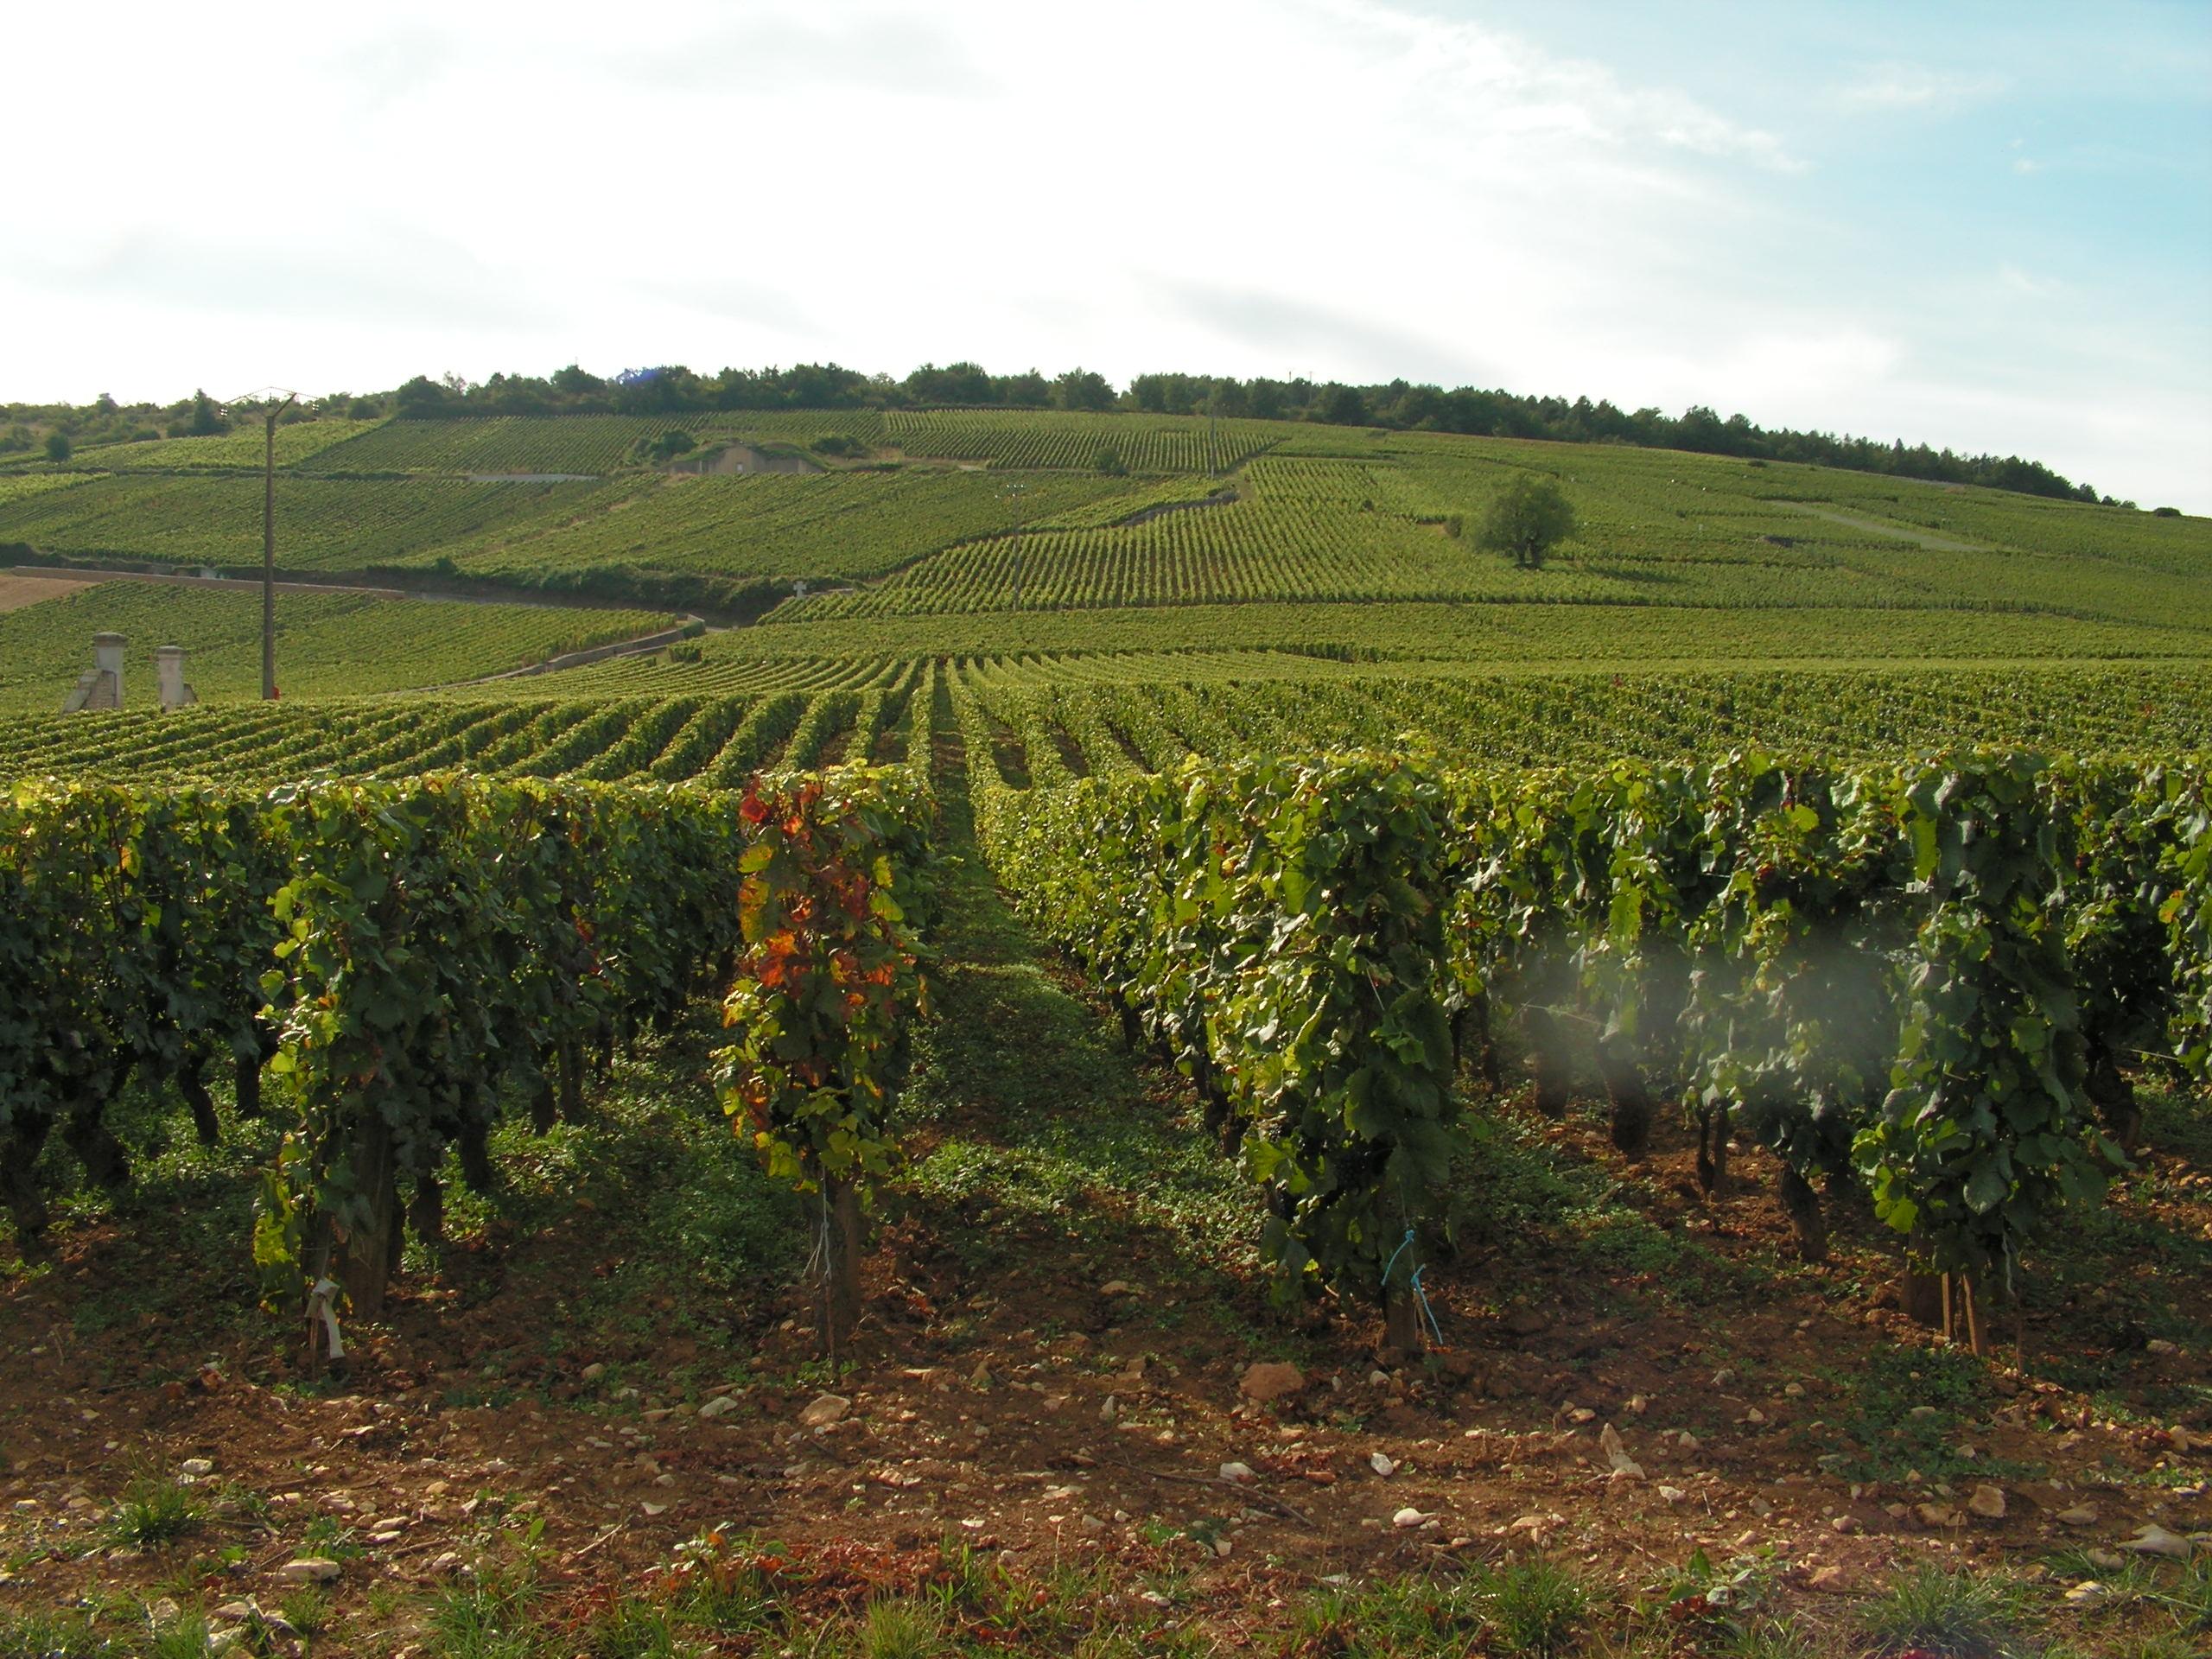 Vignoble de La Romanée Conti